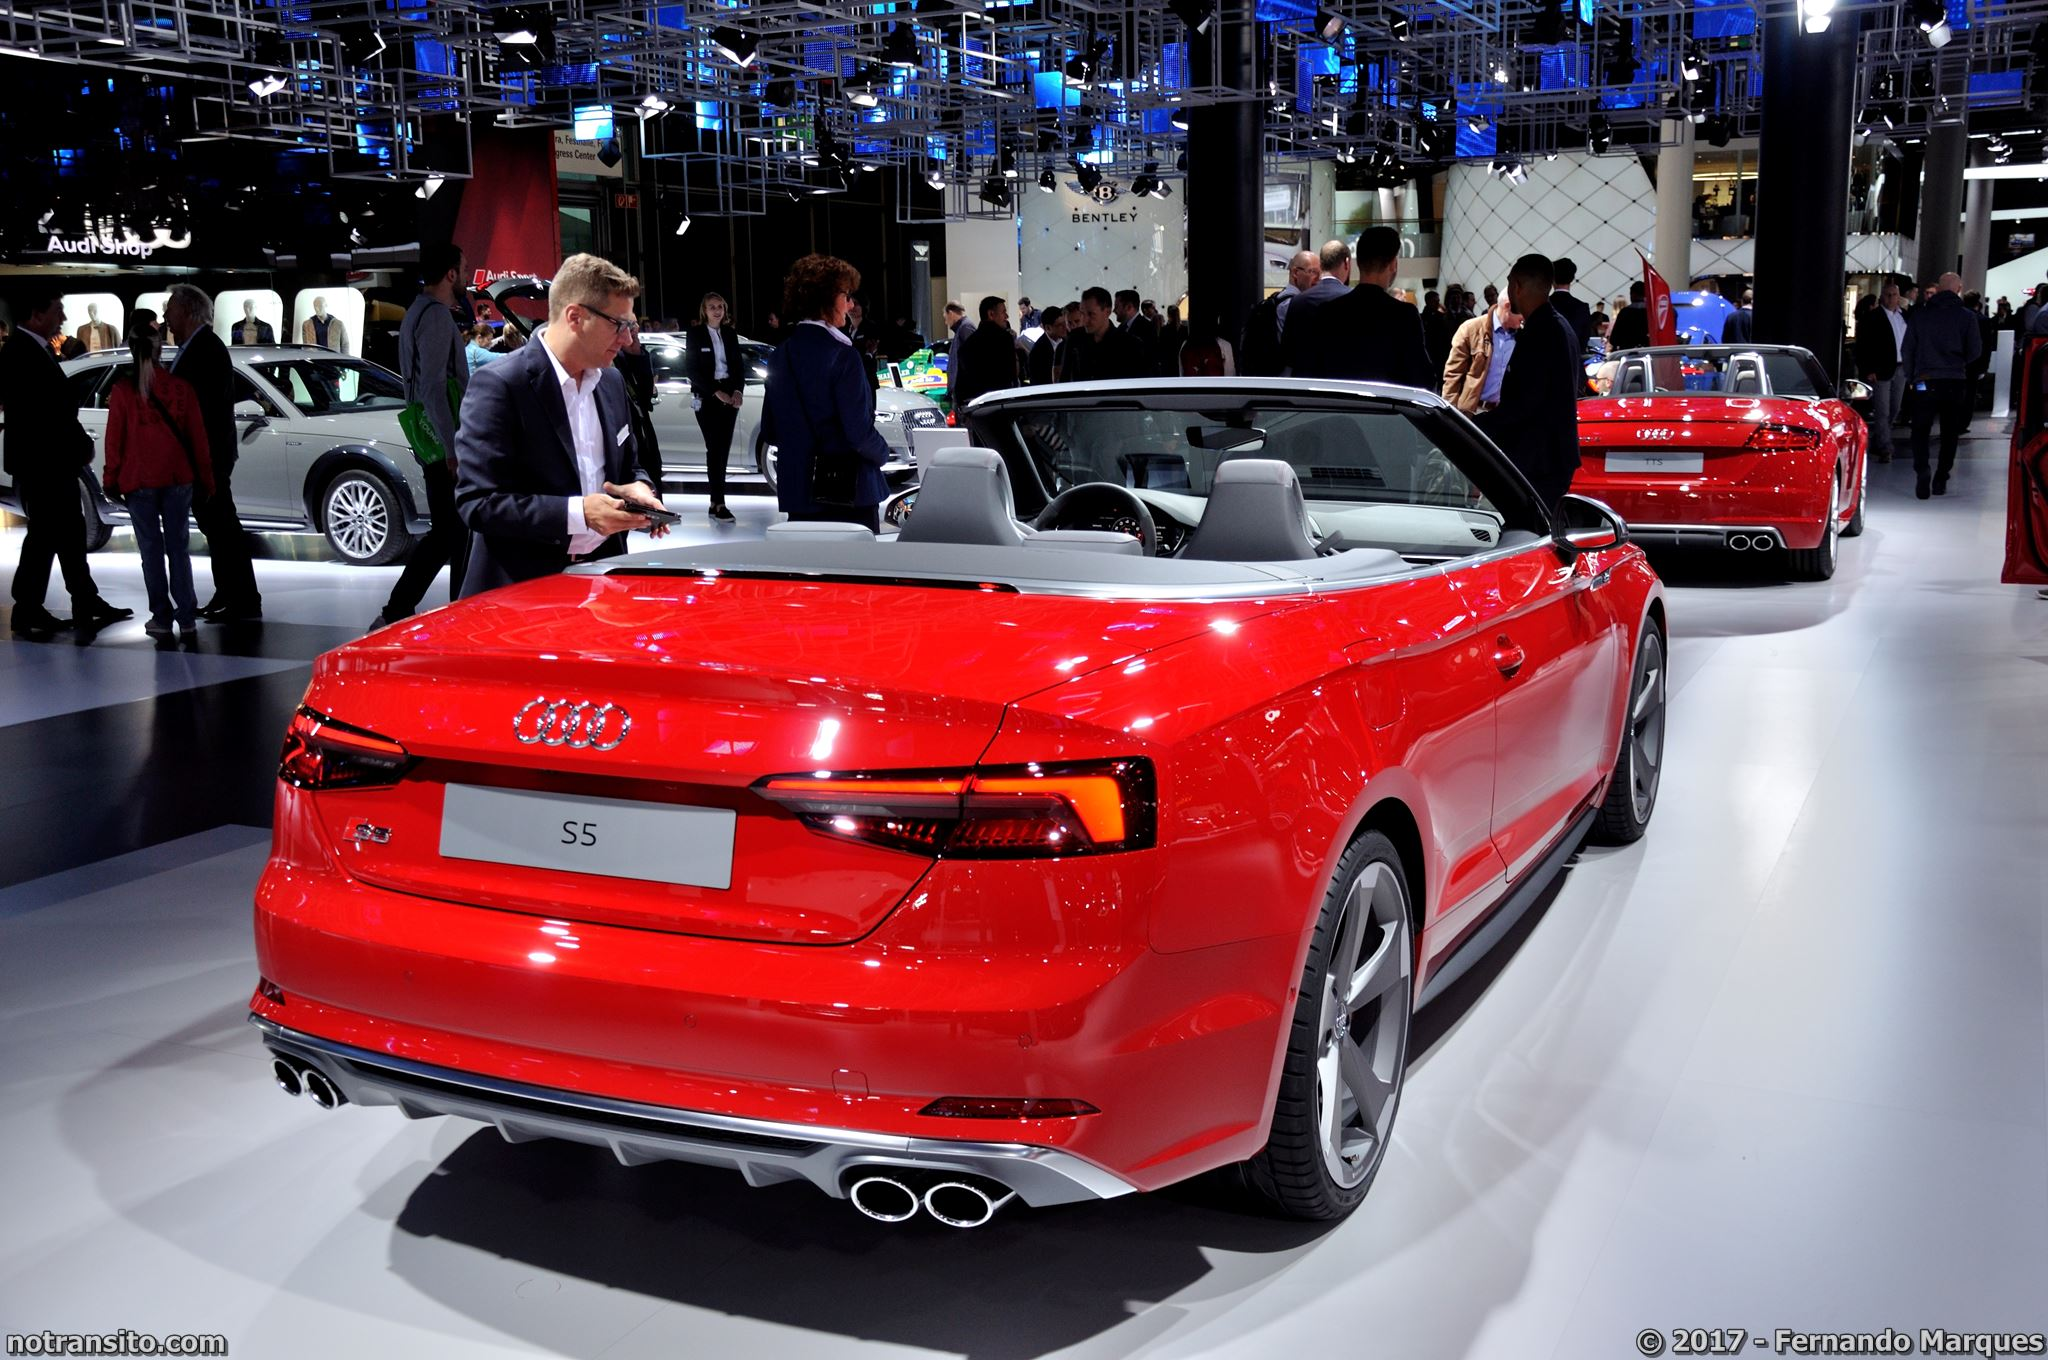 Audi-S5-Frankfurt-2017-004